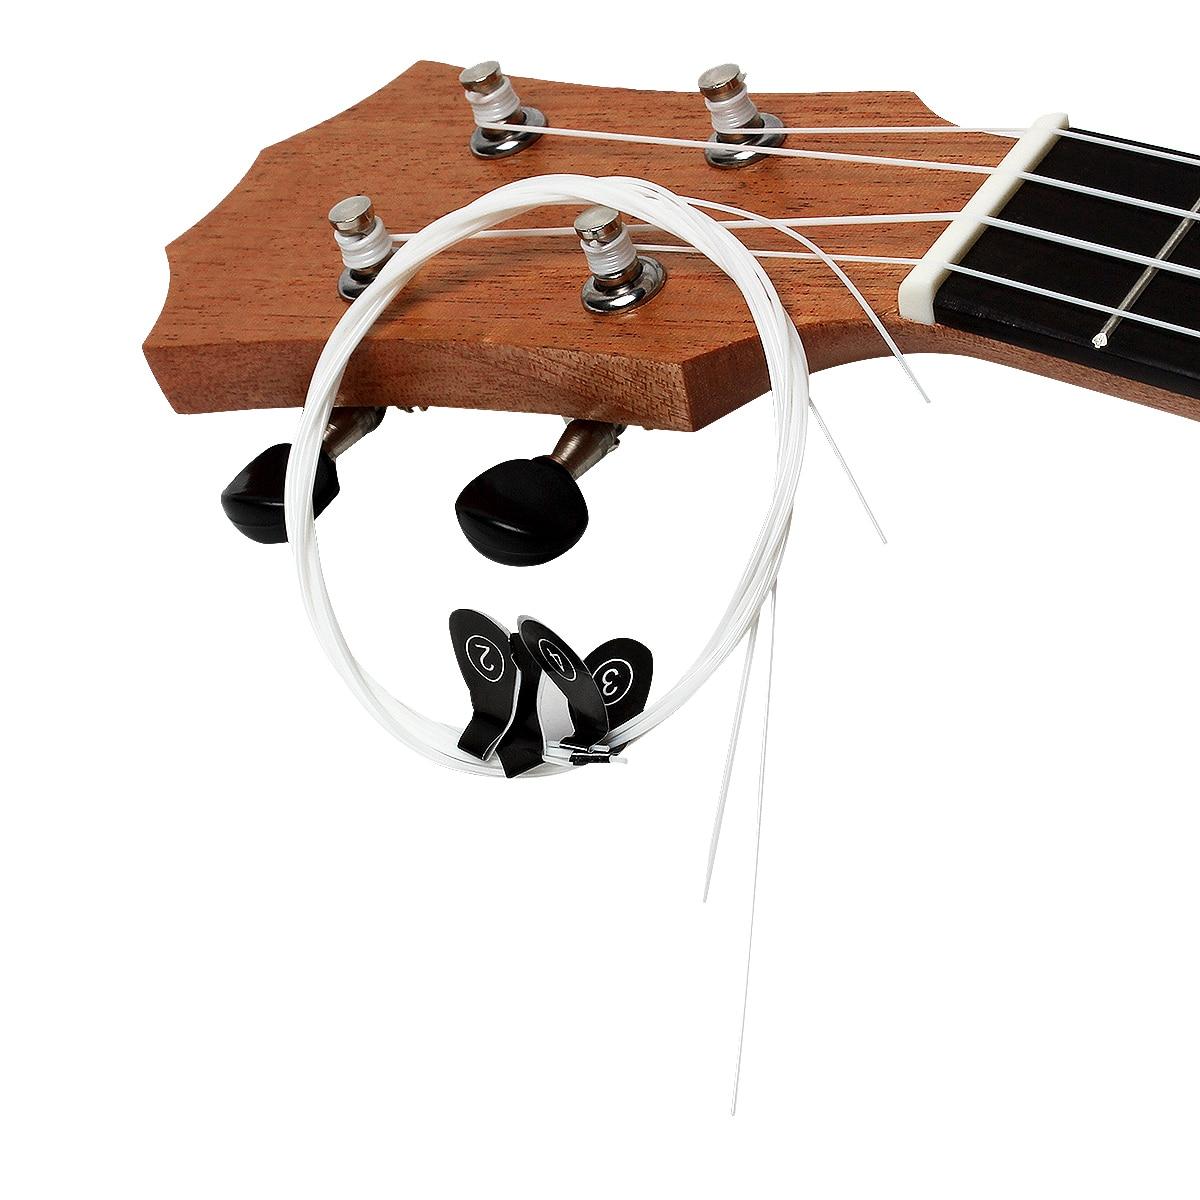 4Pcs/Set Ukulele Strings White Nylon Hawaii Four Strings Guitar Ukelele 1st-4th Strings